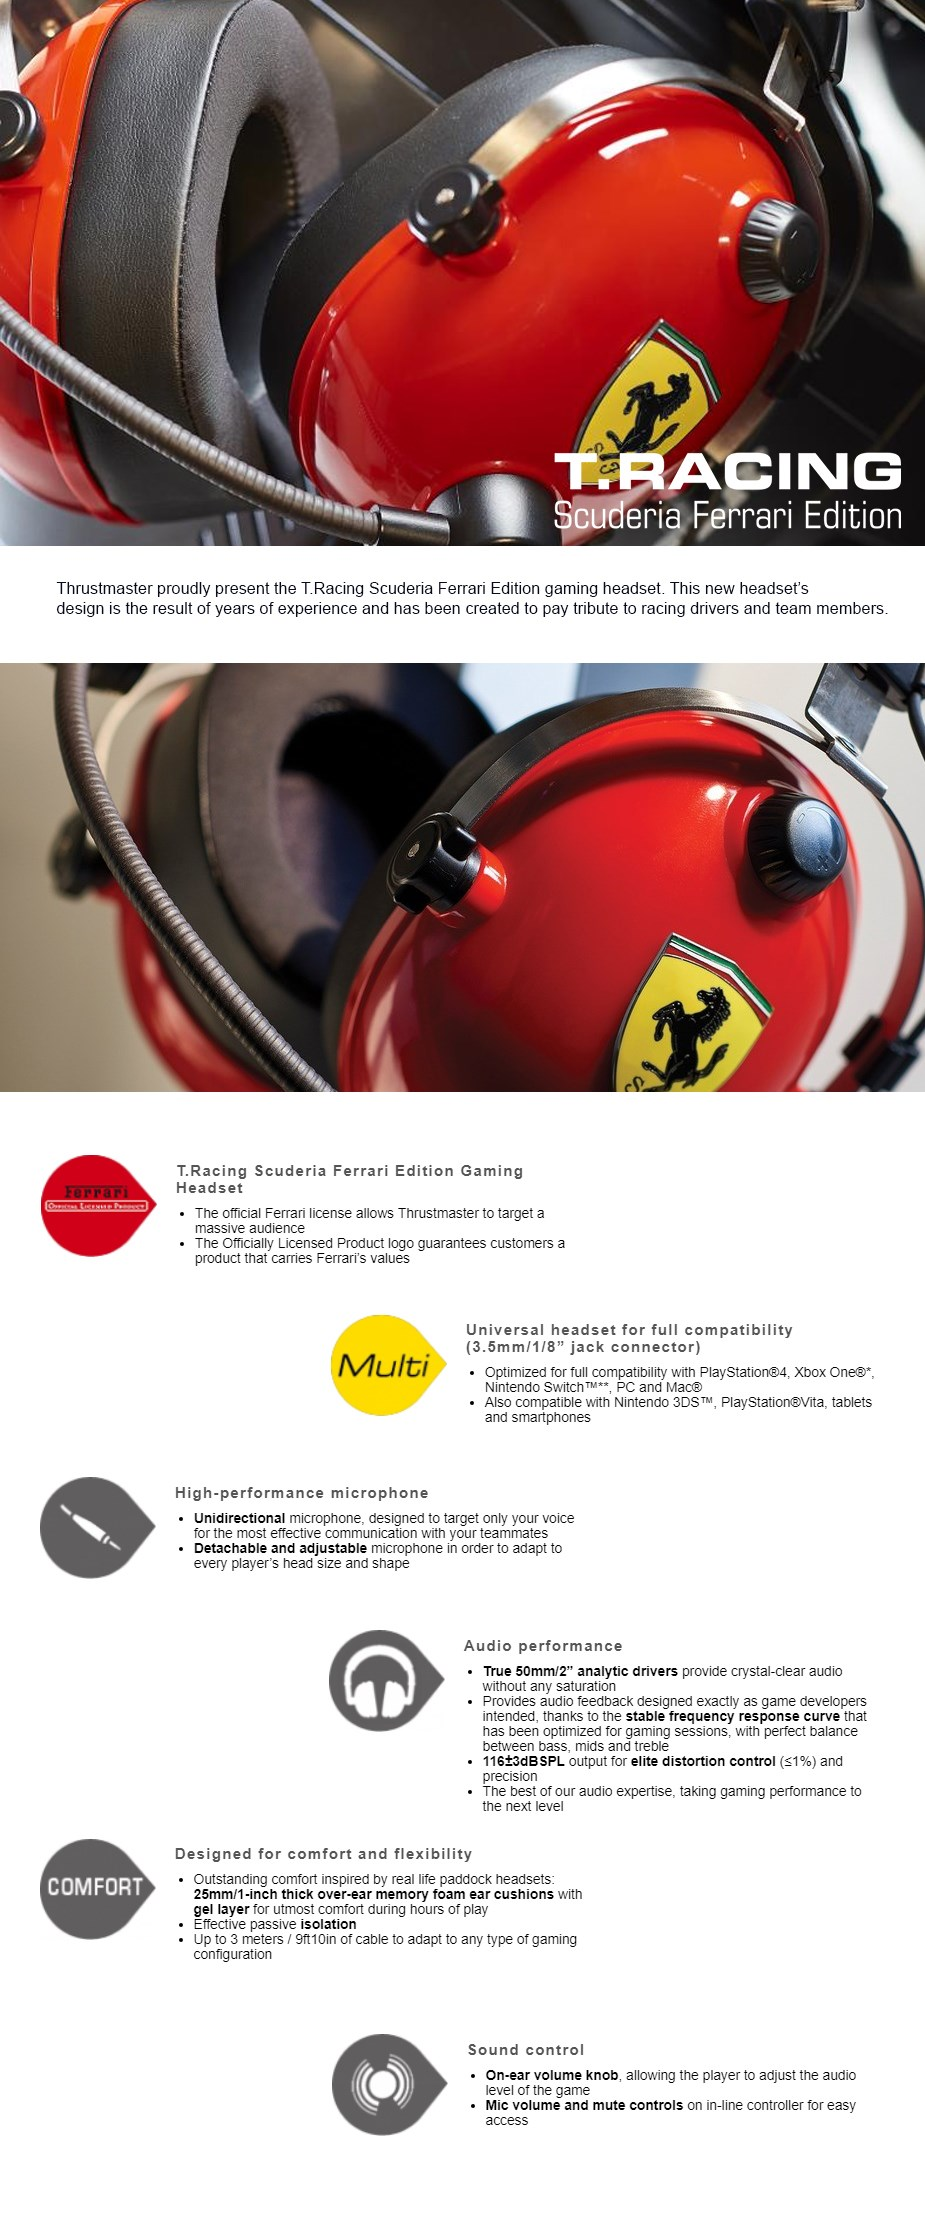 Thrustmaster T-RACING Scuderia Ferrari Edition Gaming Headset - Desktop Overview 1